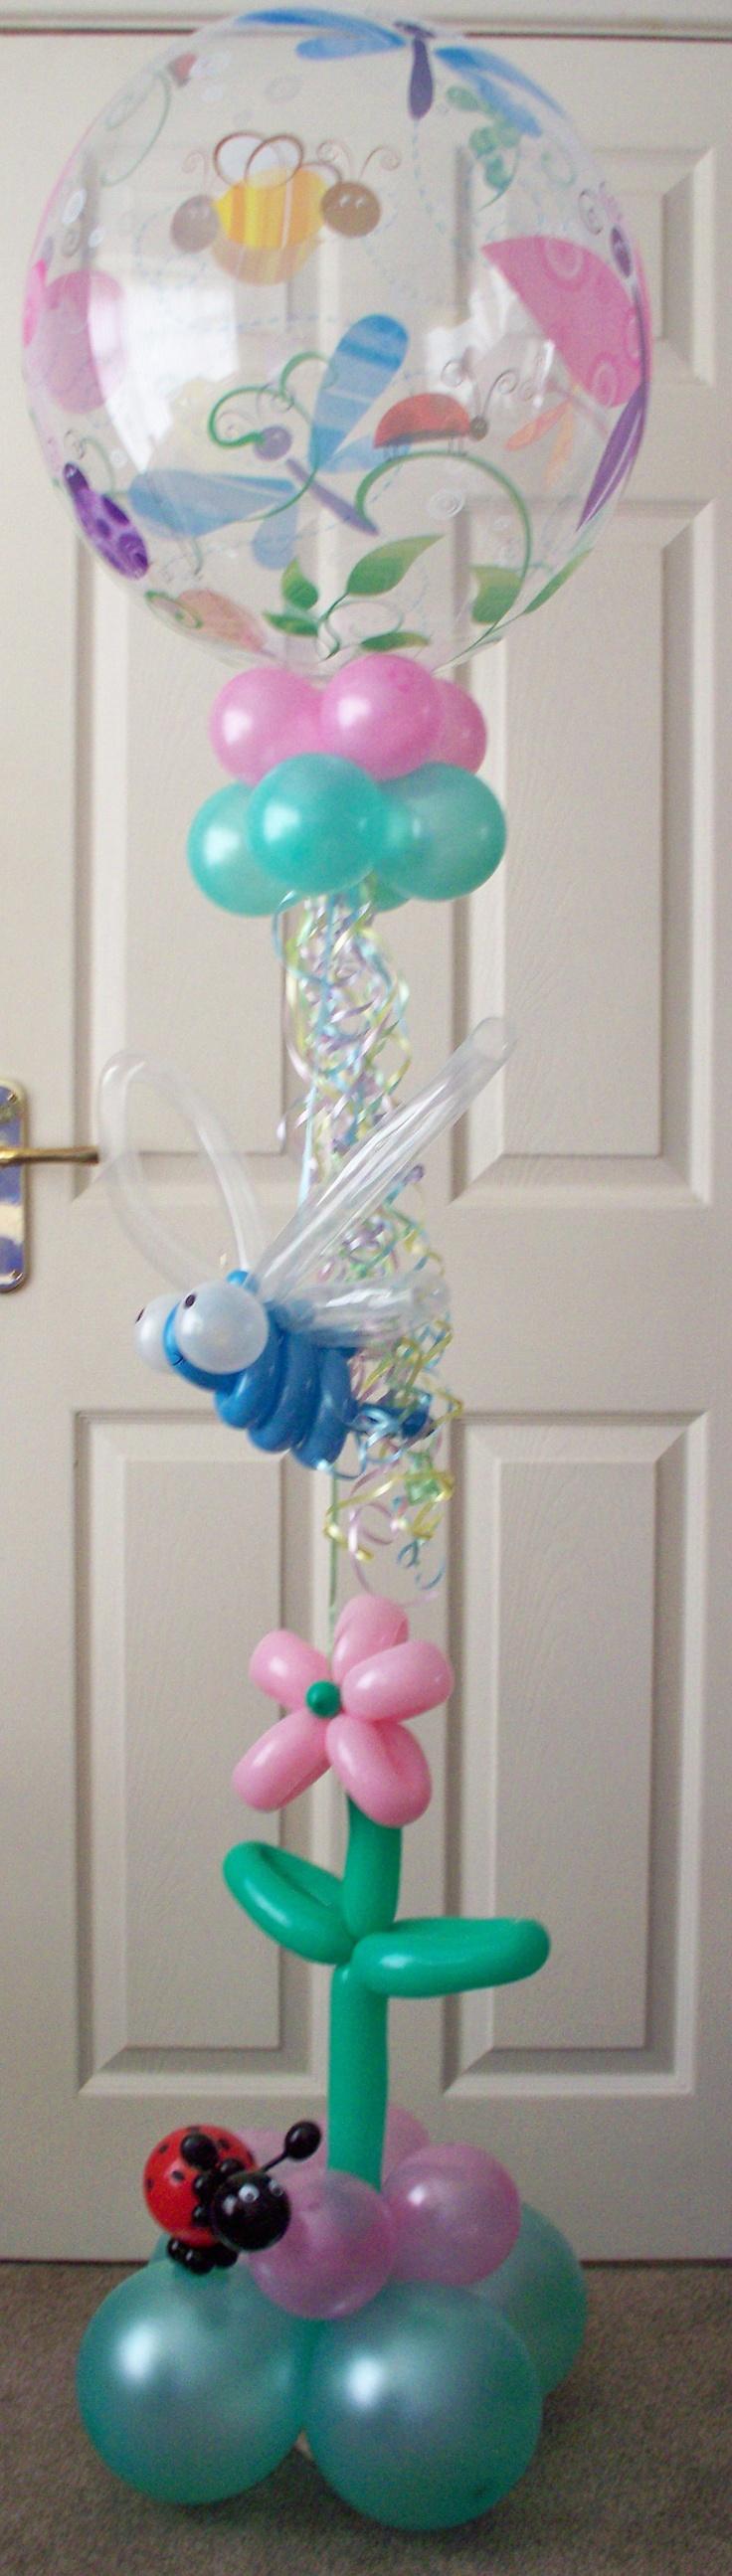 Beautiful bugs and butterflies balloon display